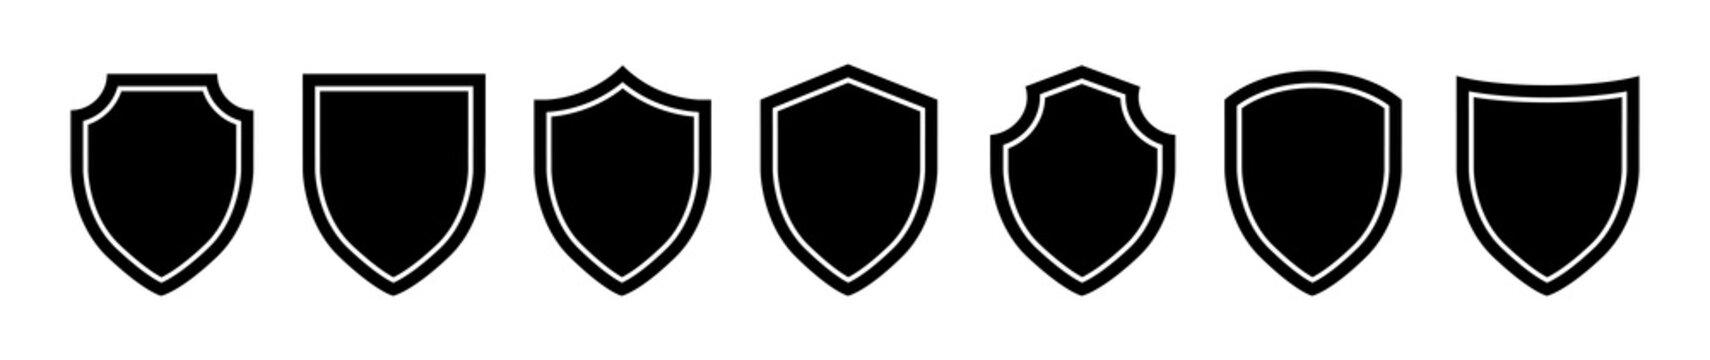 Set of Shiled icon on a white background. Isolated shiled symbol with flat style. Vector illustration.